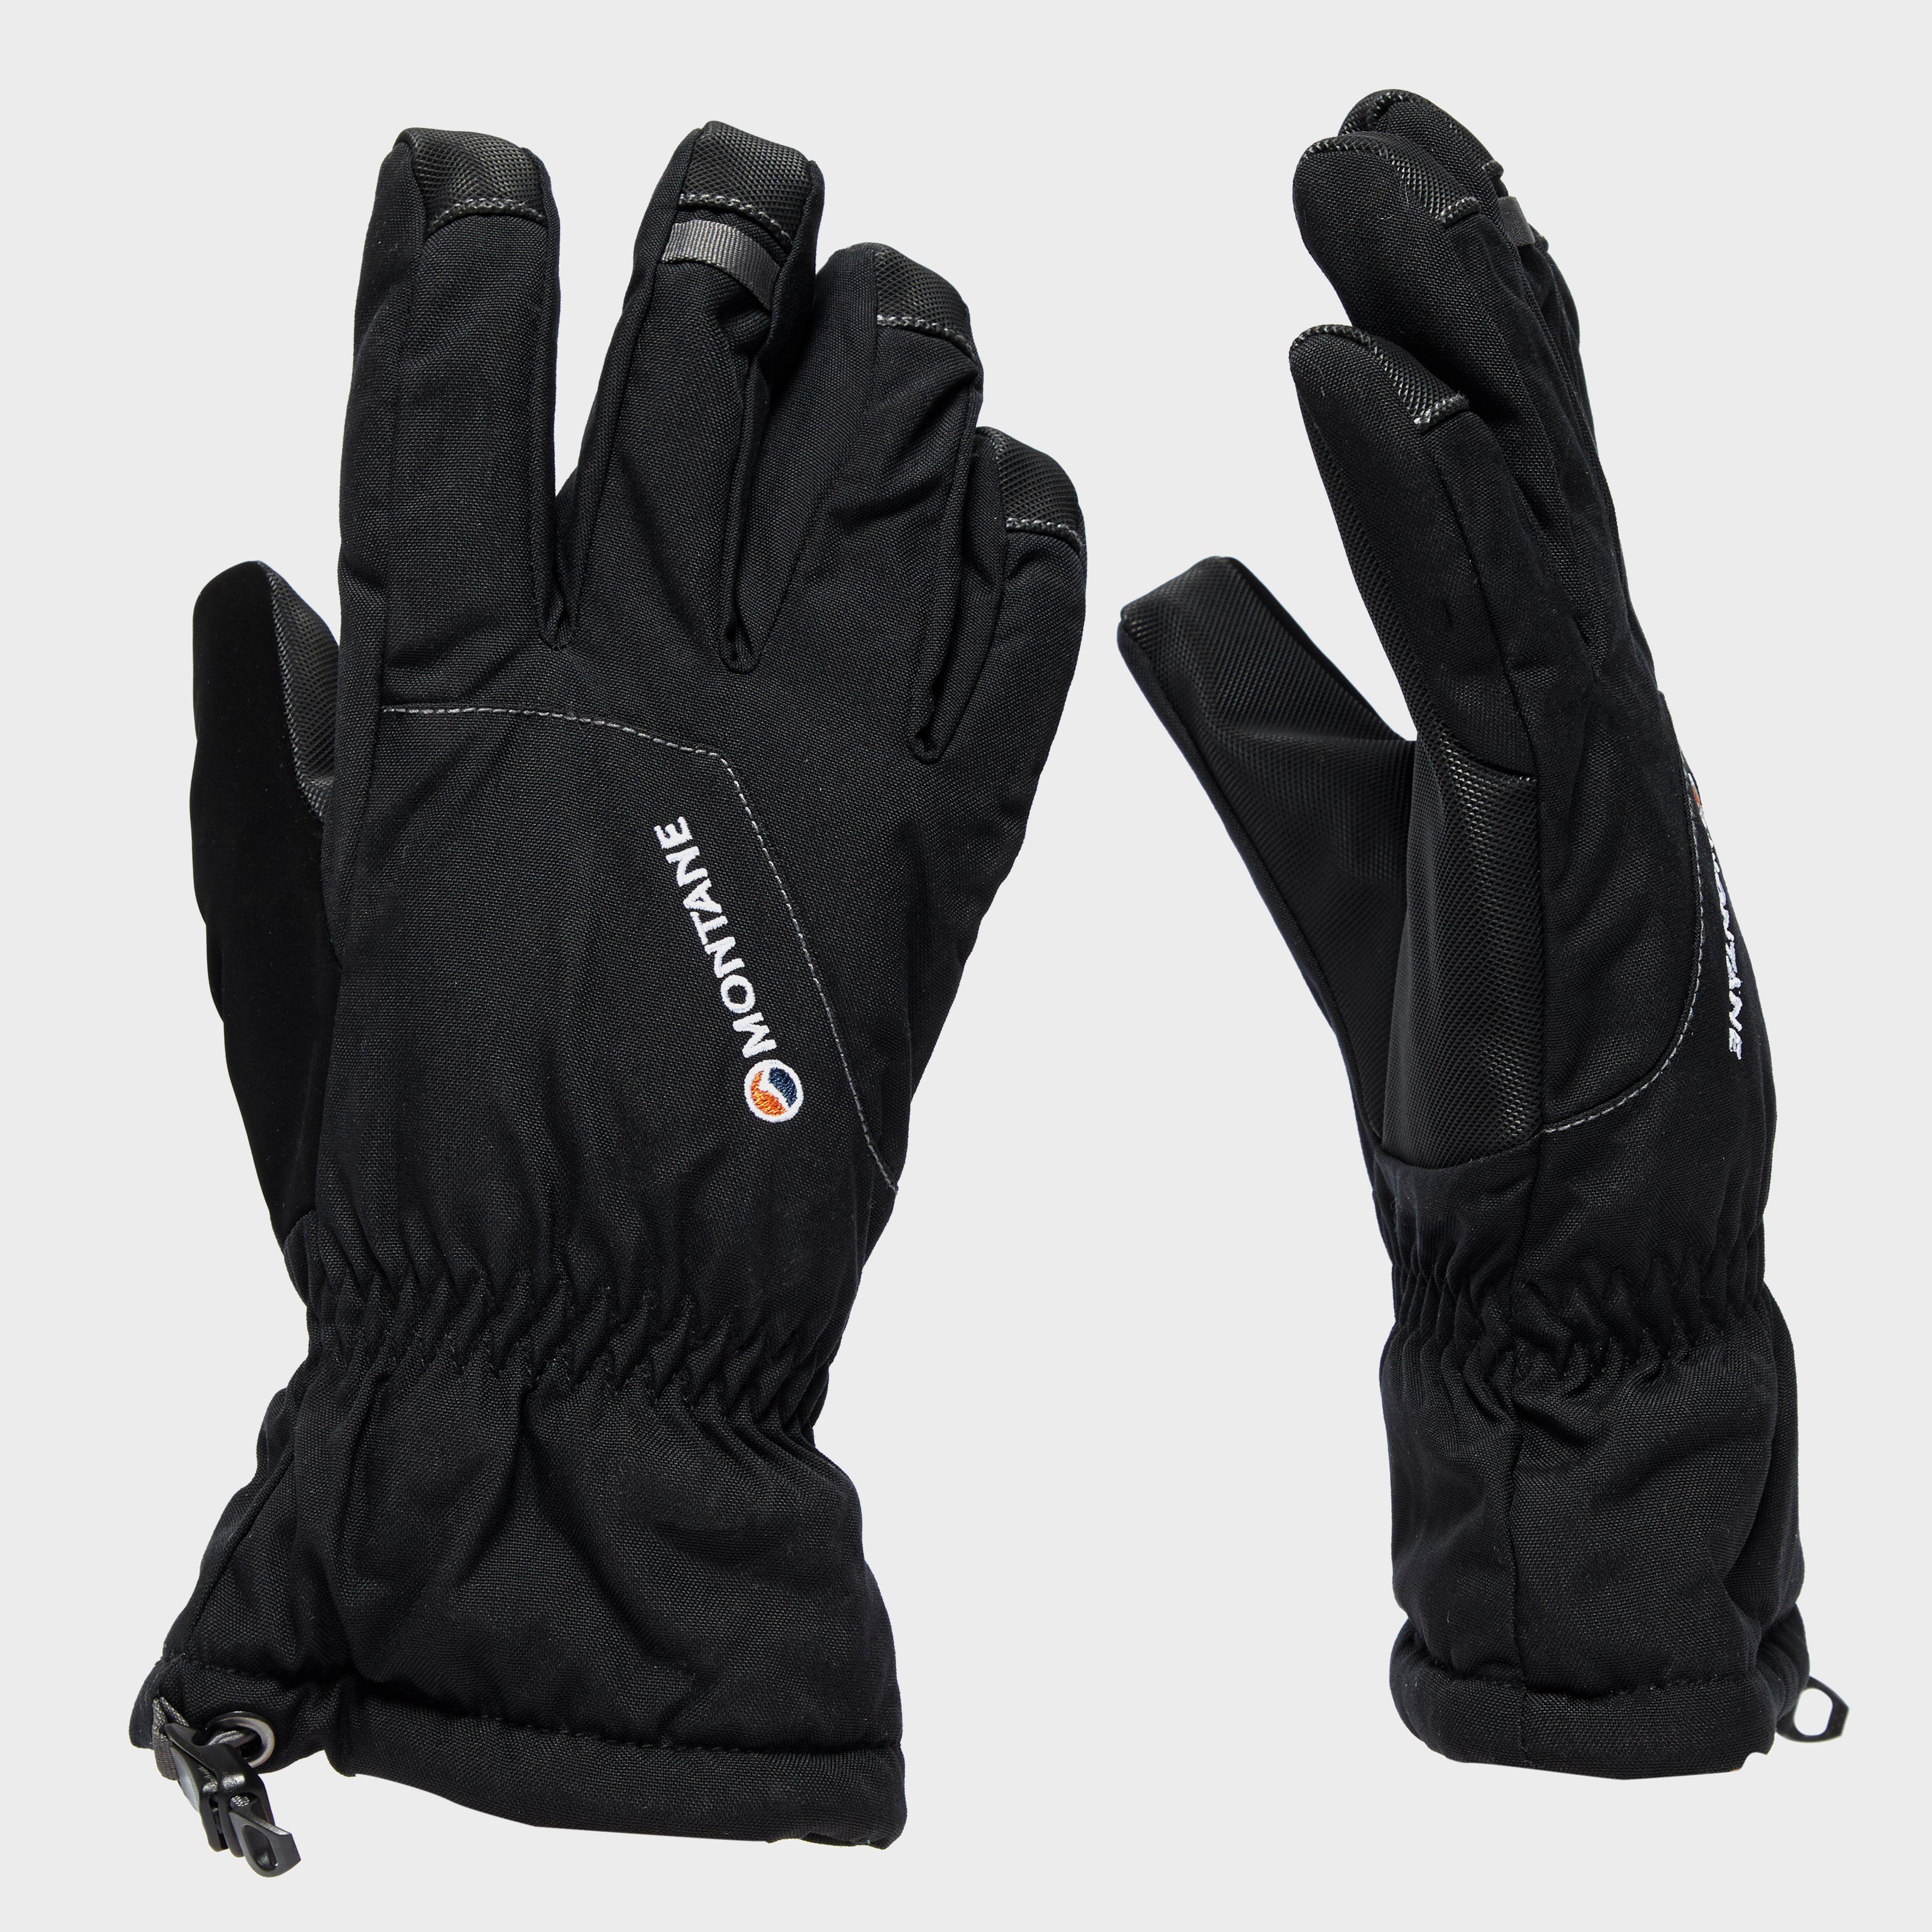 MONTANE Men's Tundra Glove